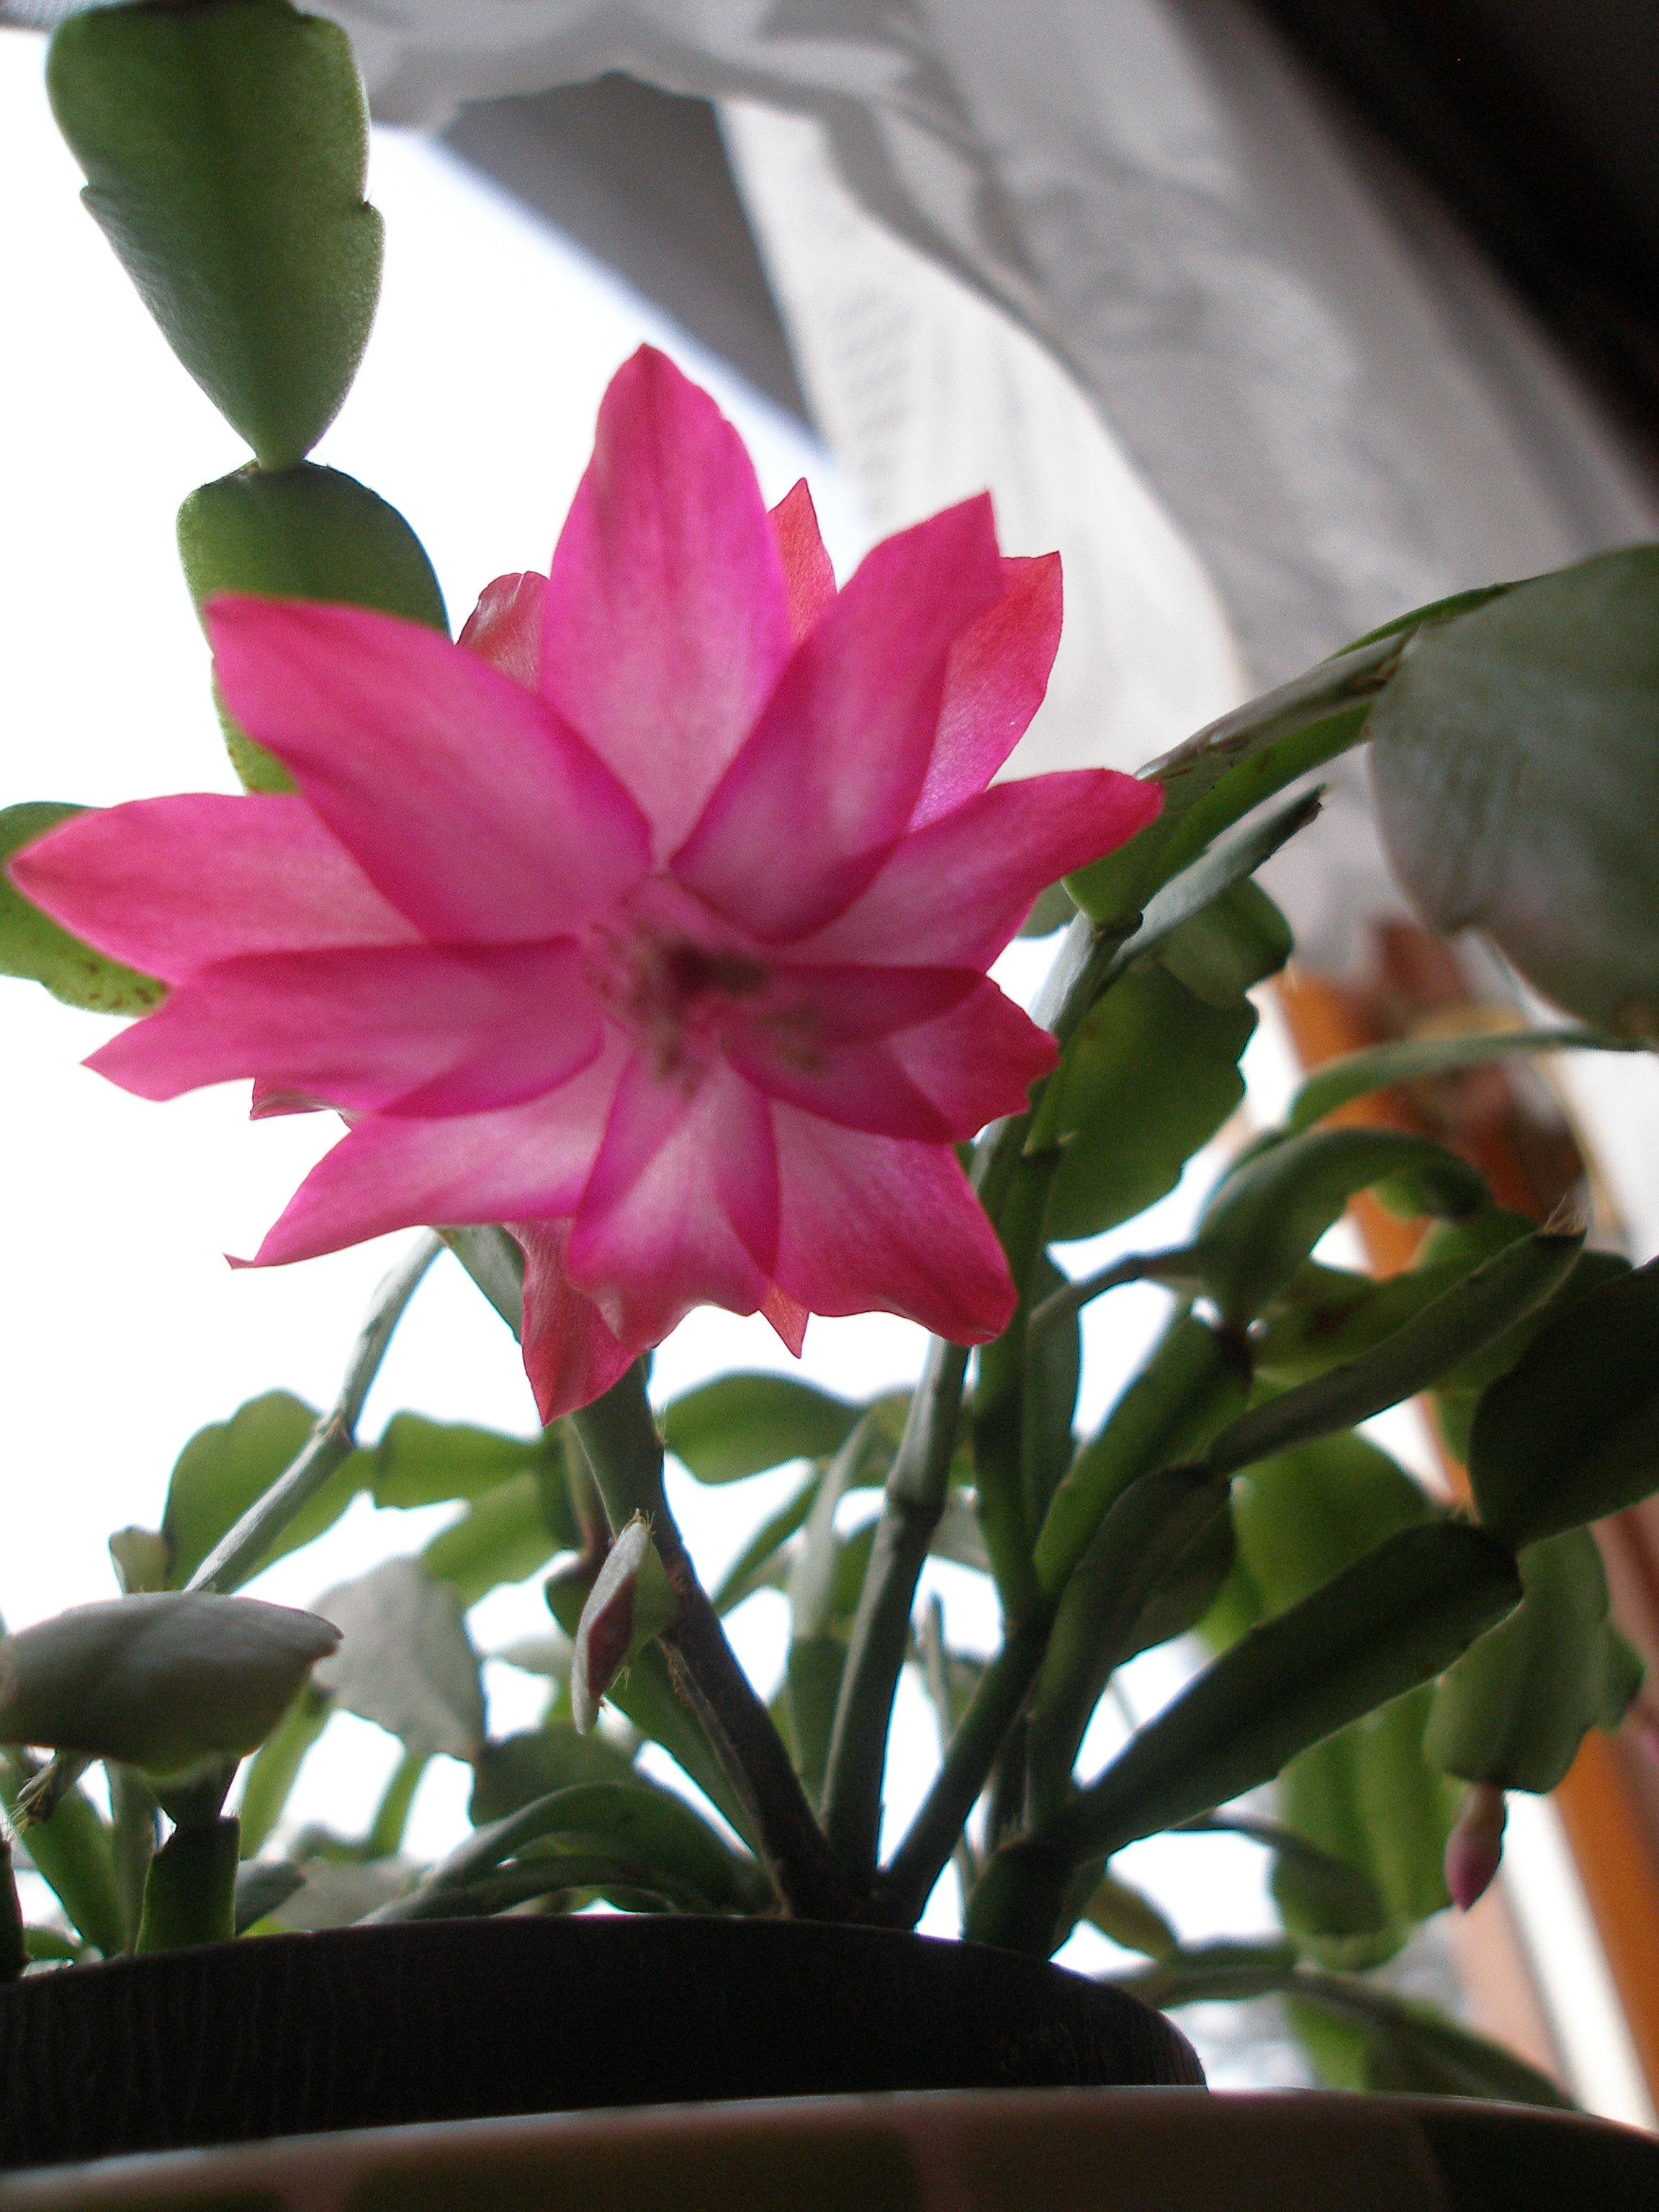 Image of false Christmas cactus